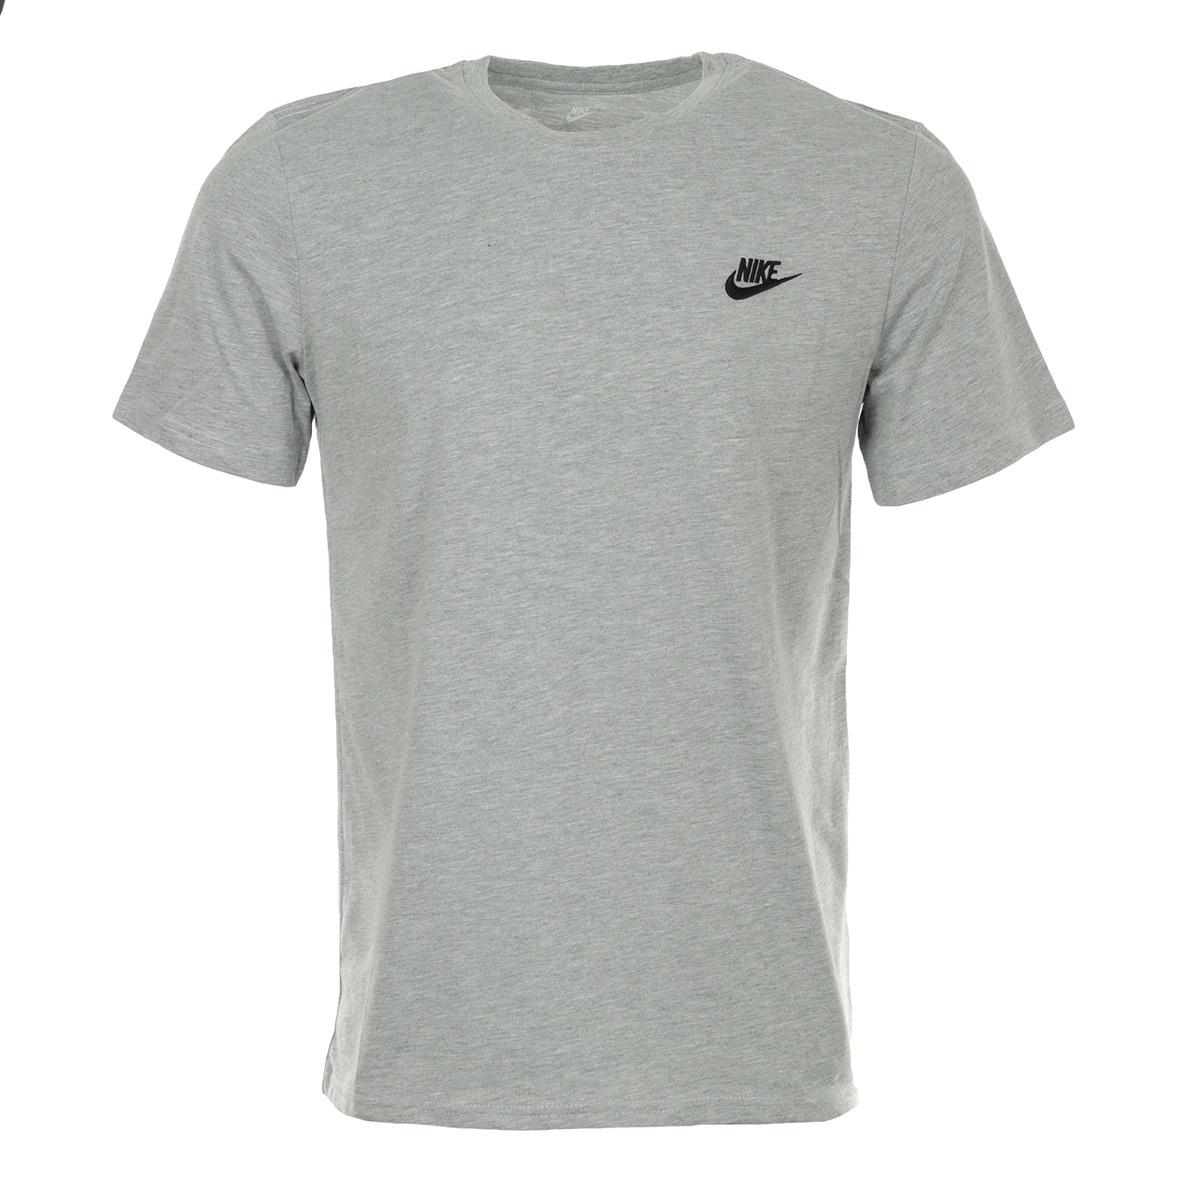 Nike Tee Club Futura 827021068, T Shirts homme